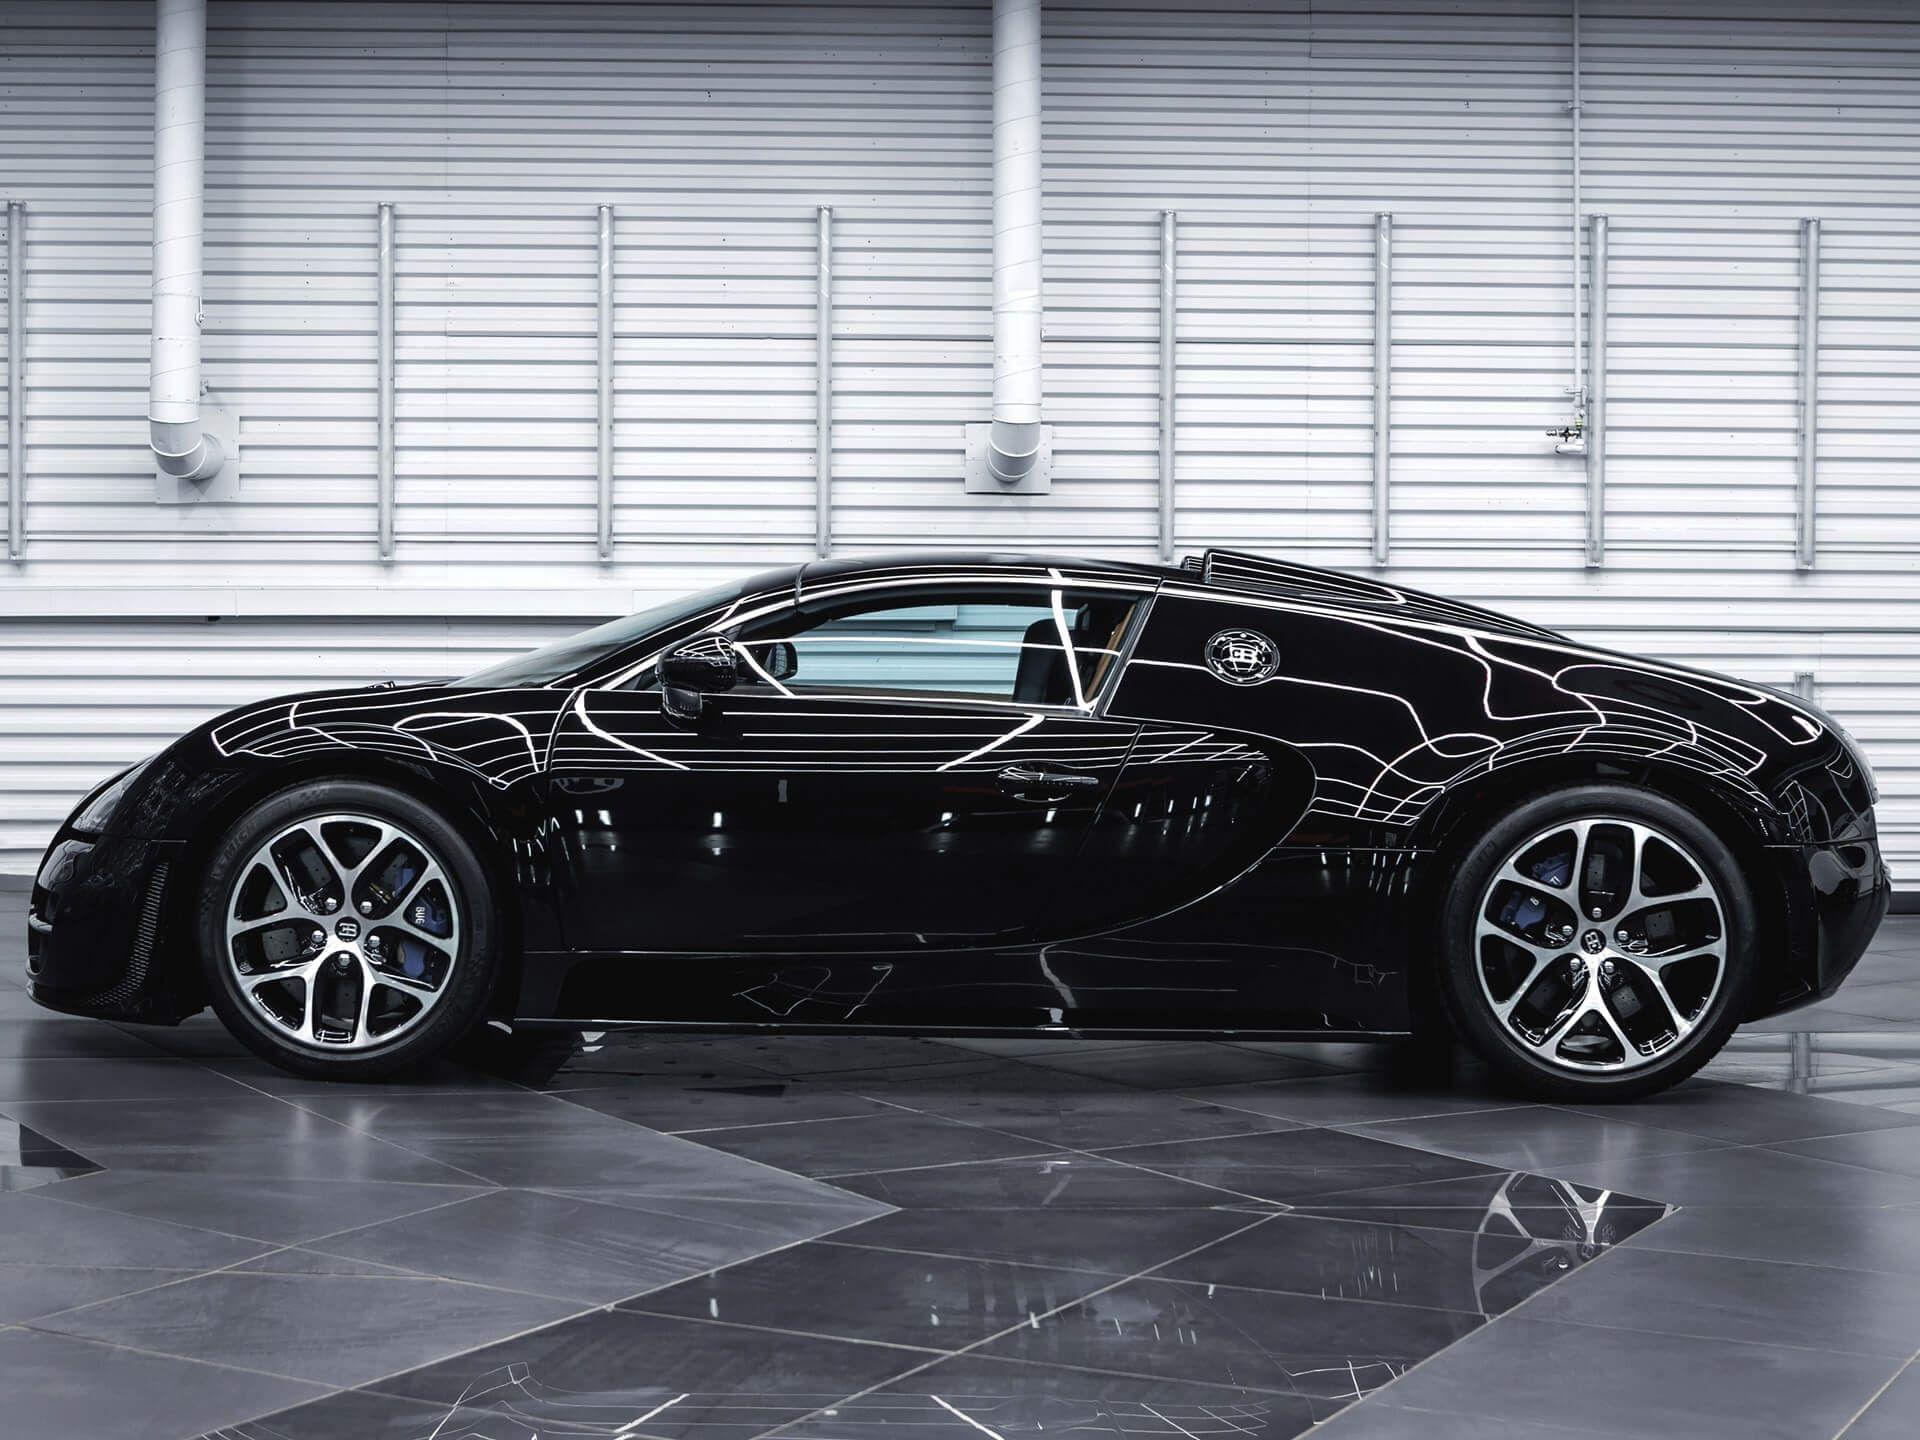 Bugatti Veyron 16 4 Grand Sport Vitesse Huayra Automoviles Coches